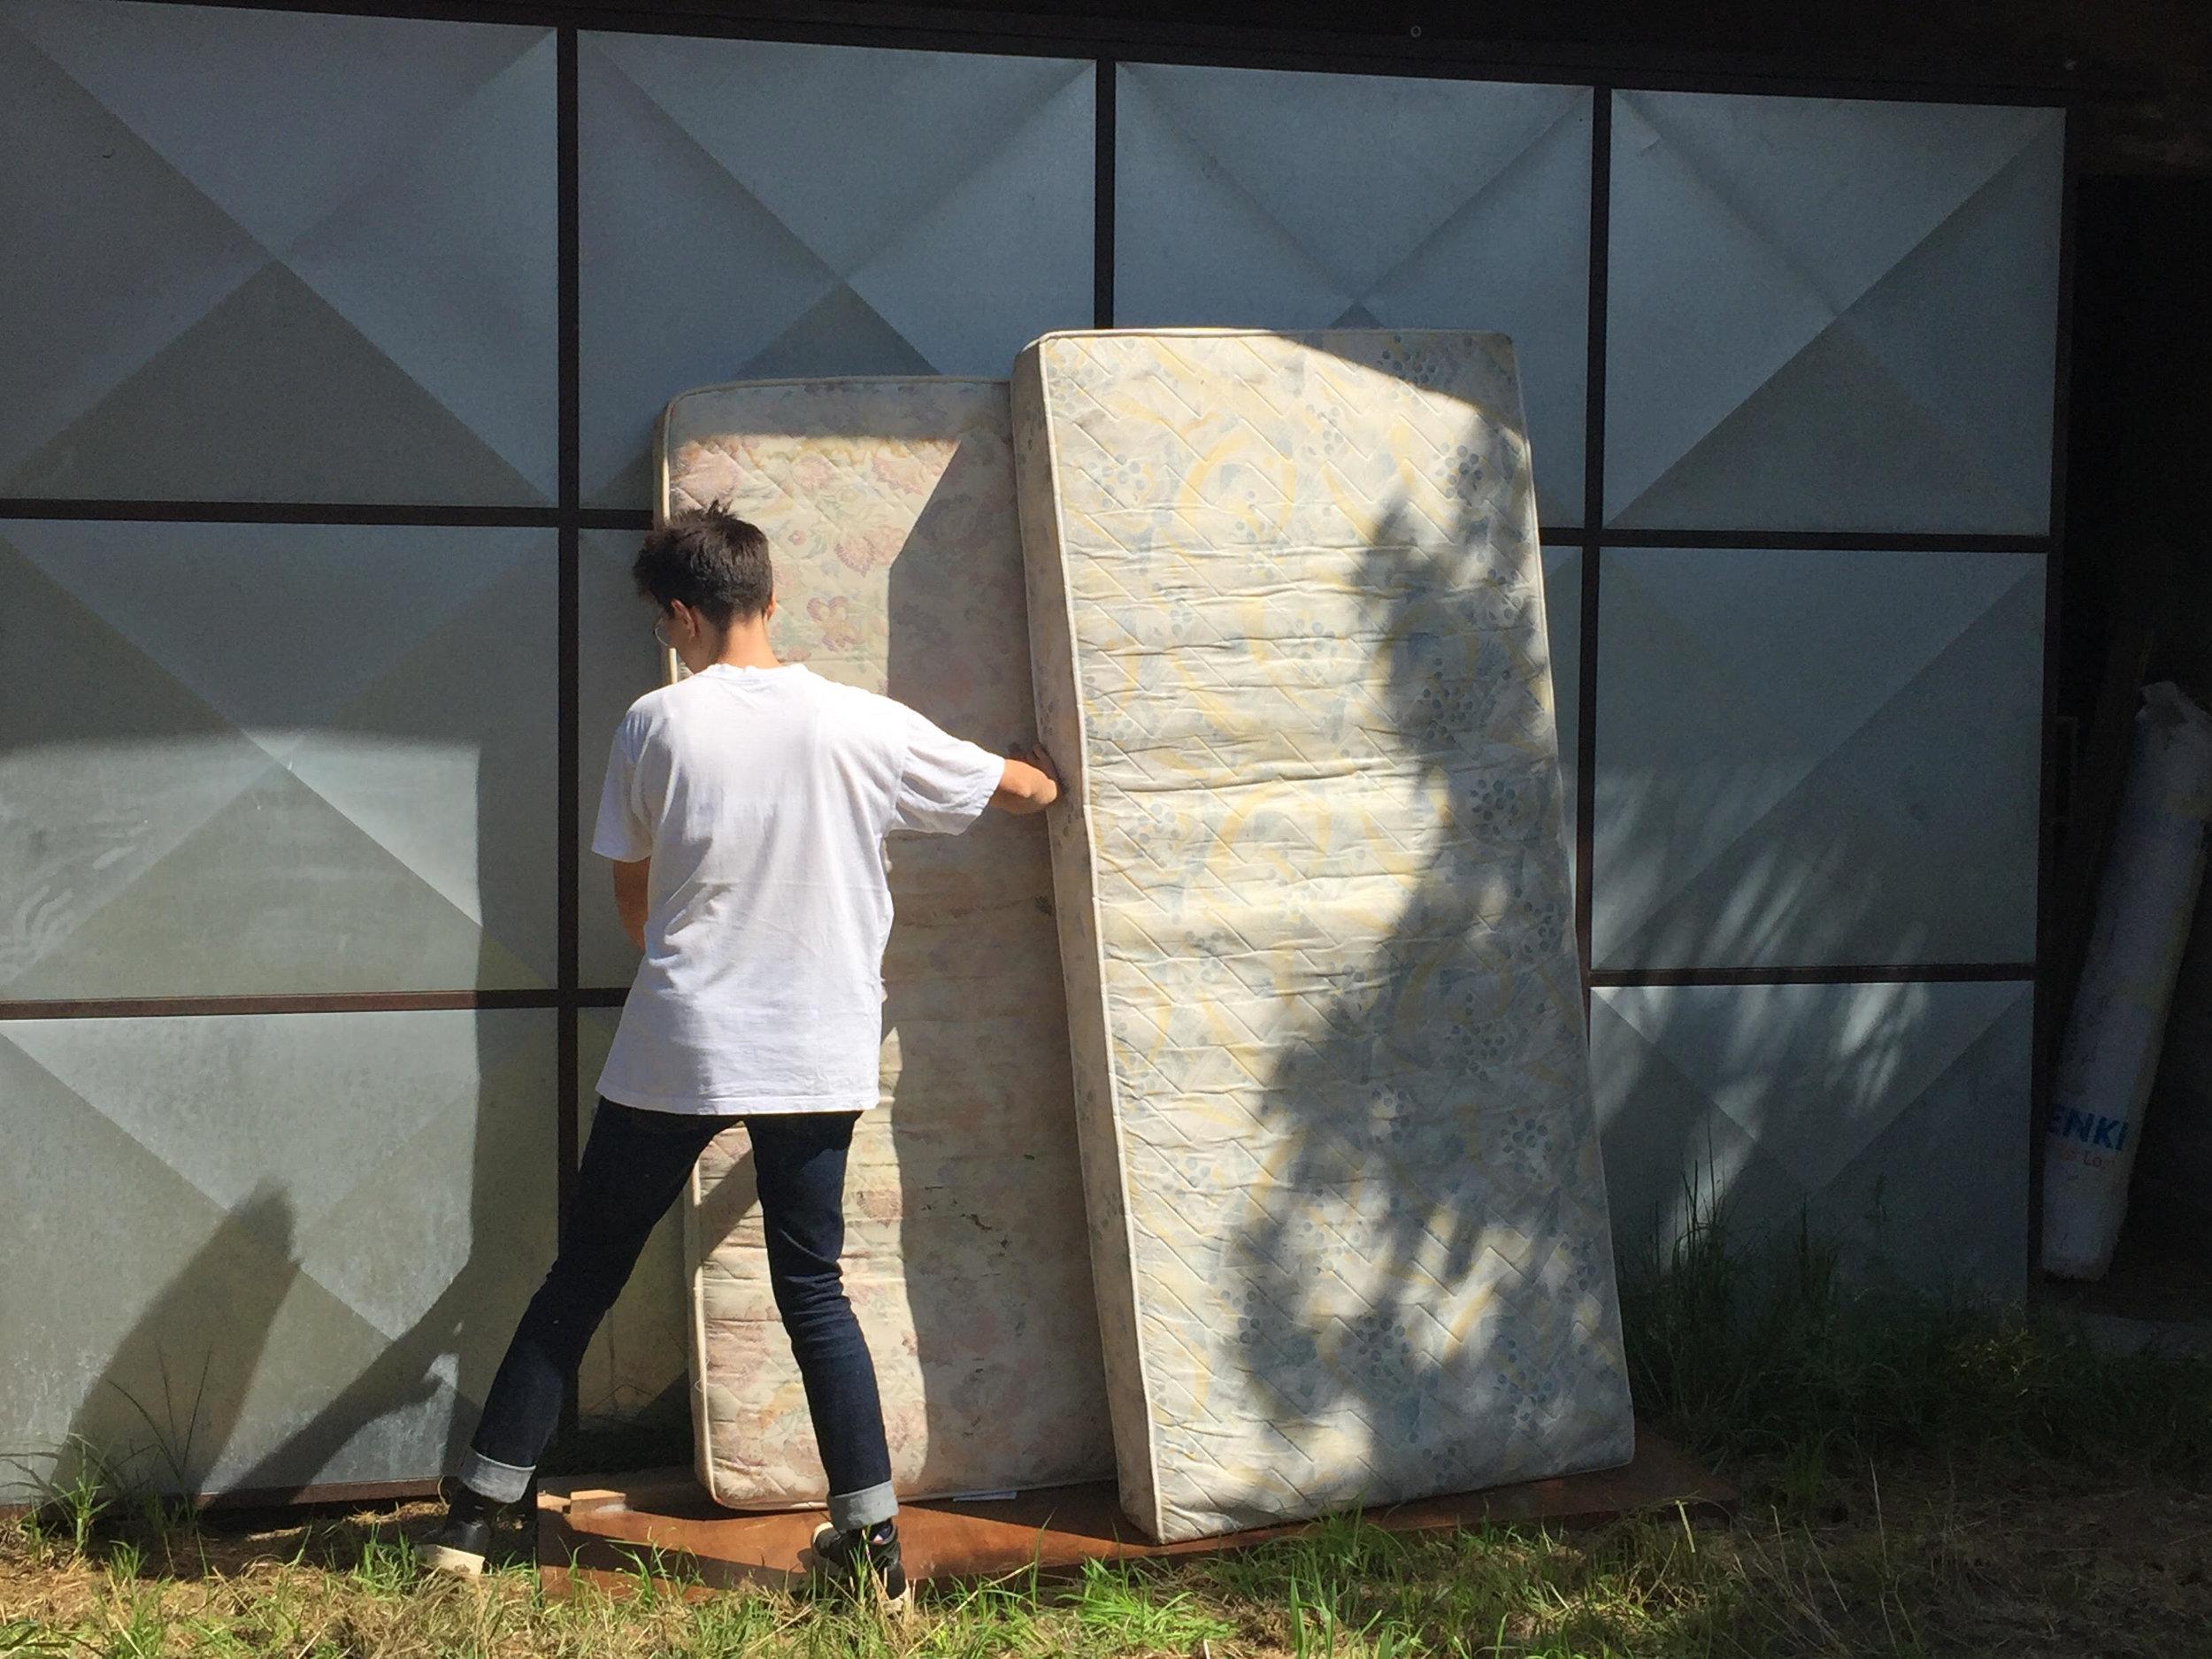 Day 5 & 6: visiting Virije, finding mattresses